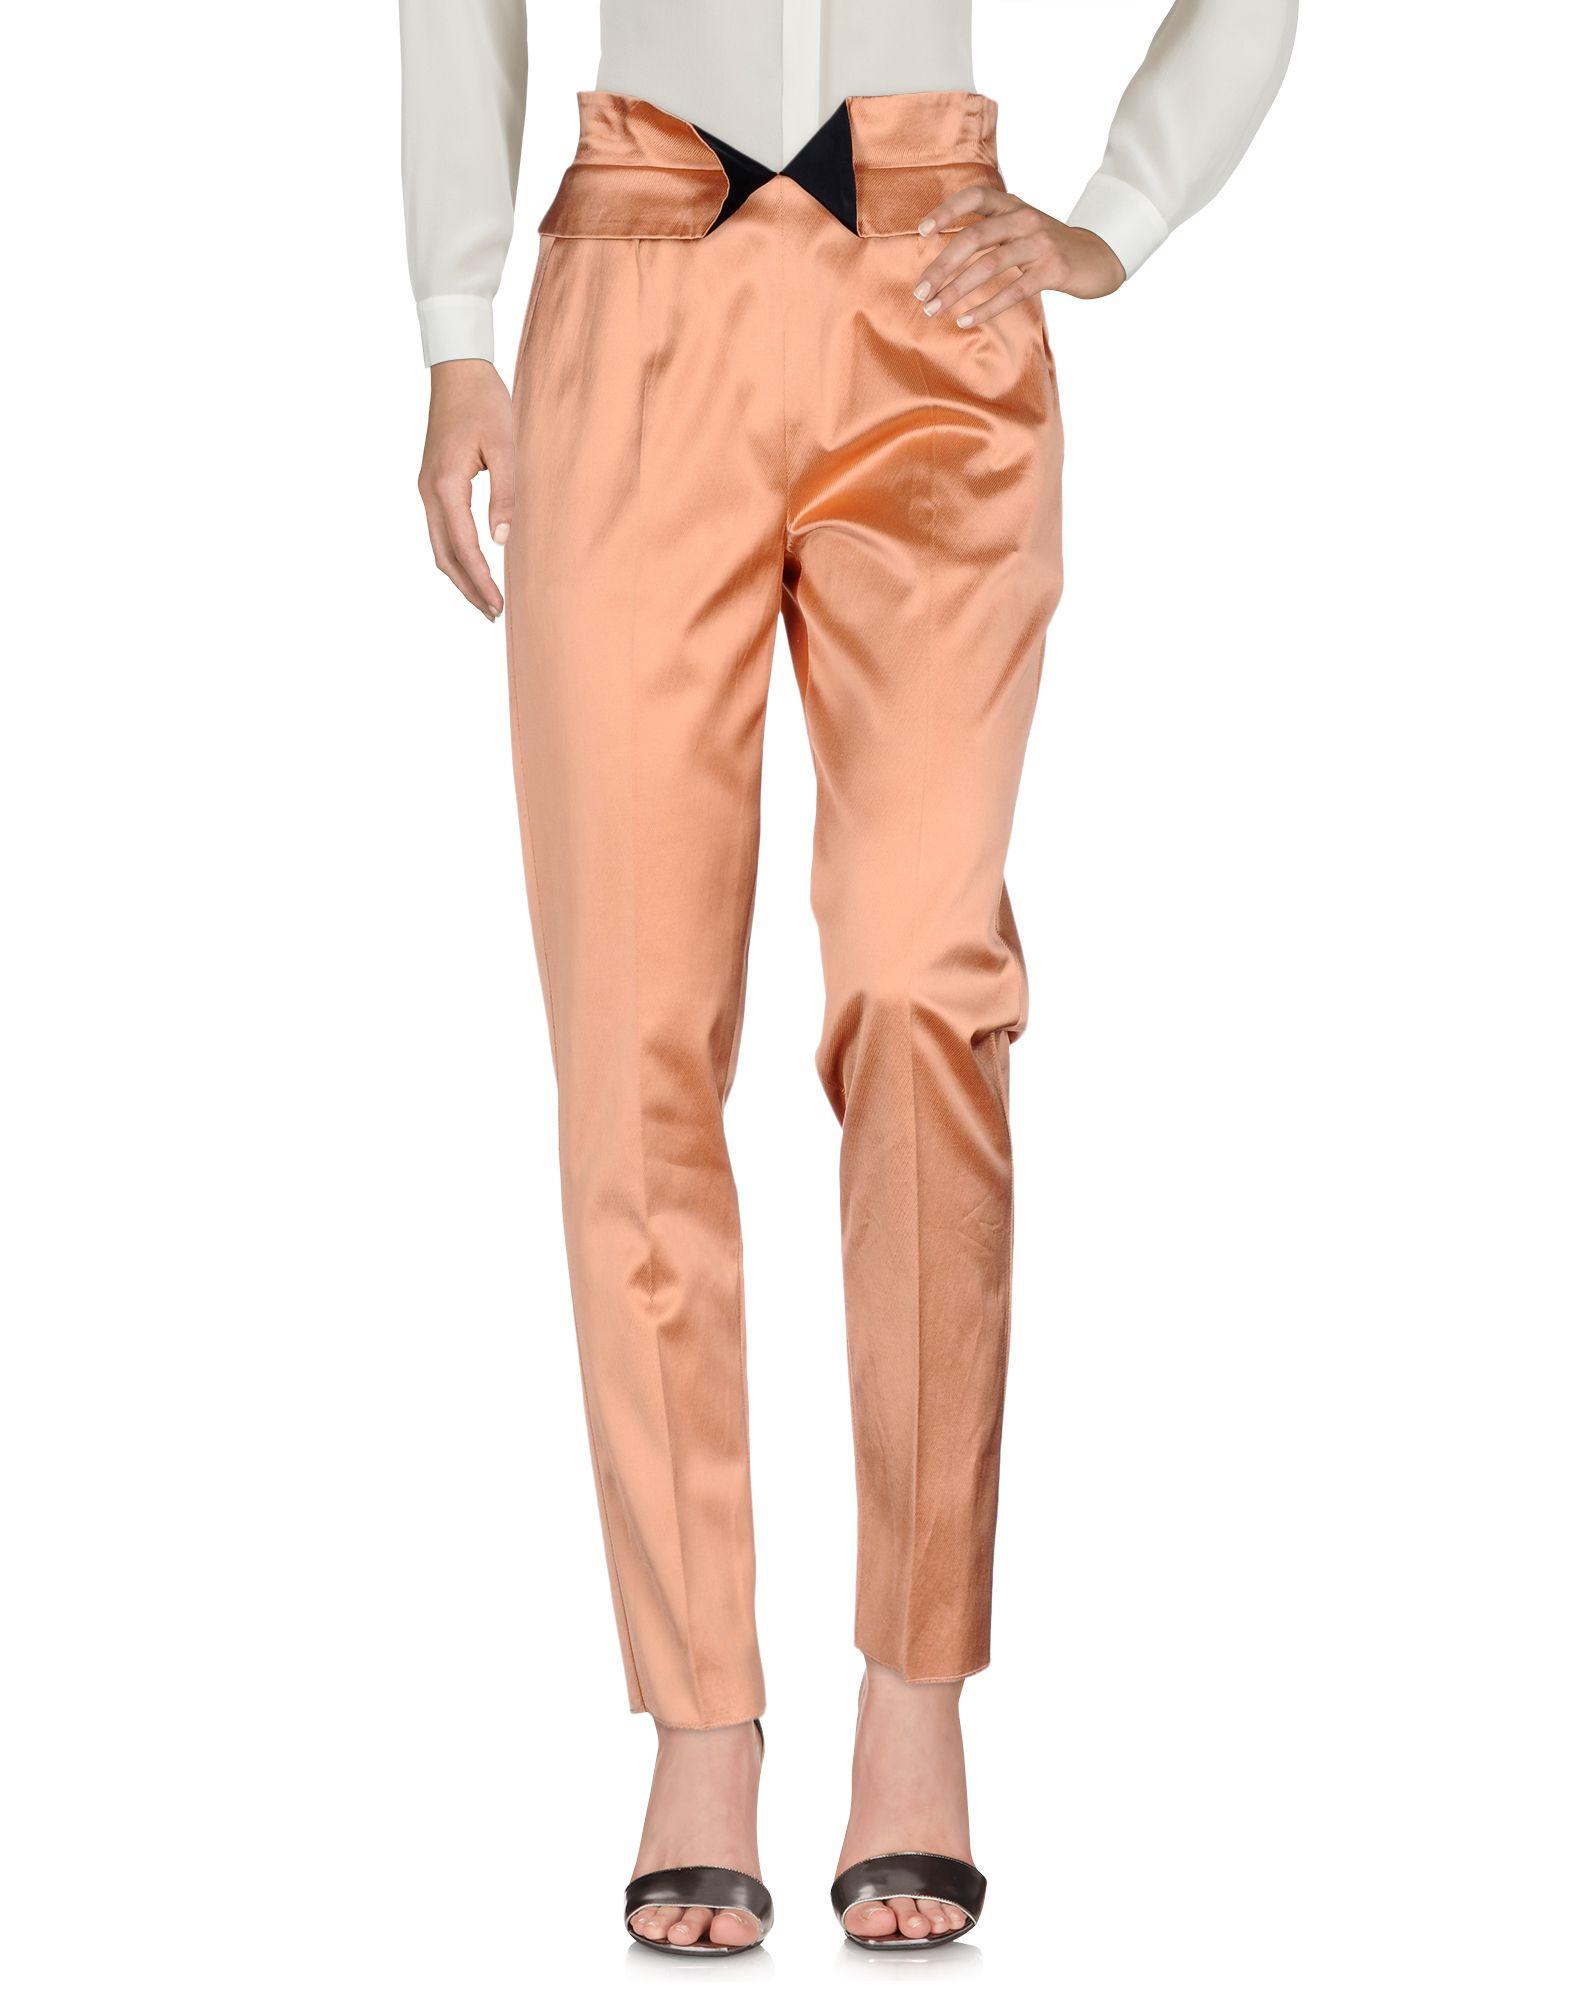 Pantalone Just Cavalli Donna - Acquista online su 0BqzXiMp2